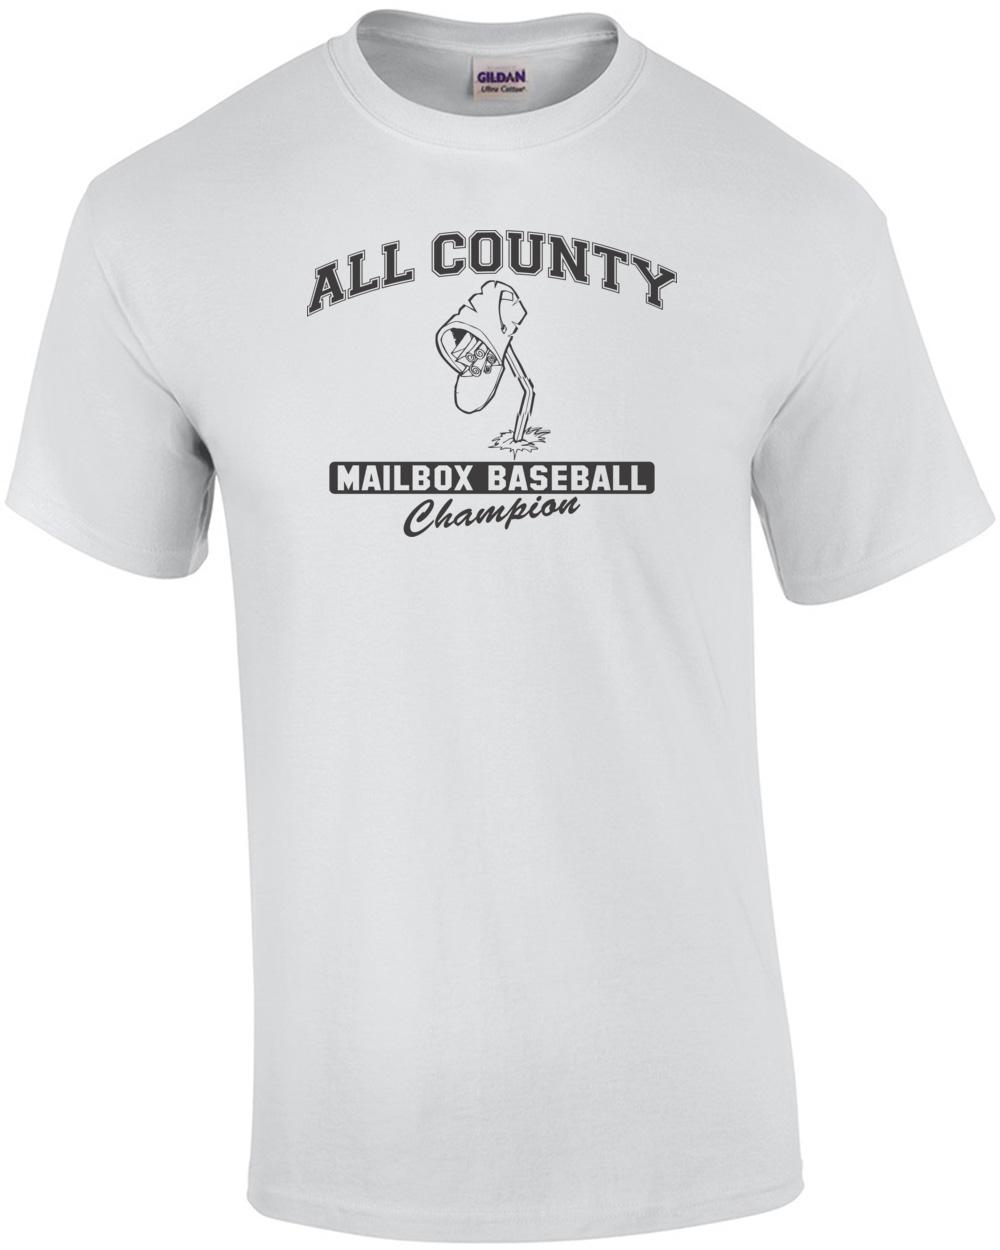 baseball champion t shirt designs